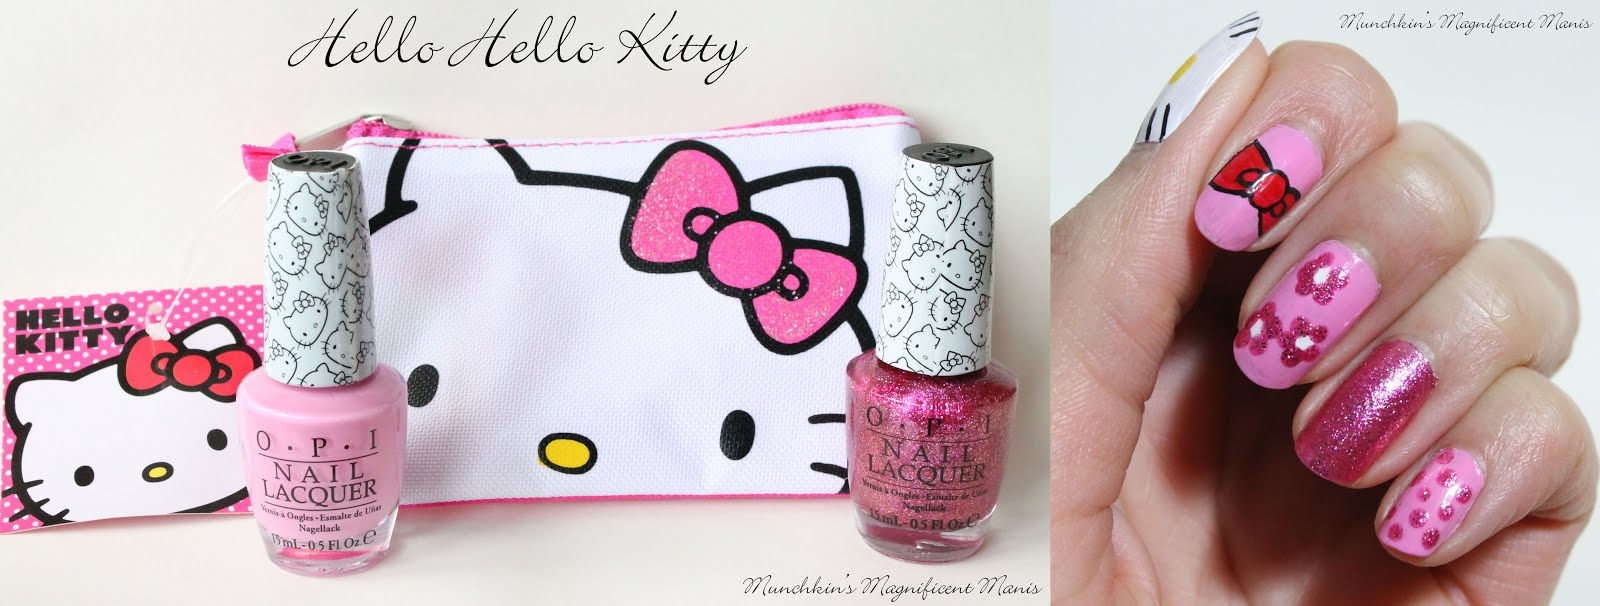 Munchkins magnificent manis hello hello kitty nail art tutorial opi hello kitty collection prinsesfo Gallery